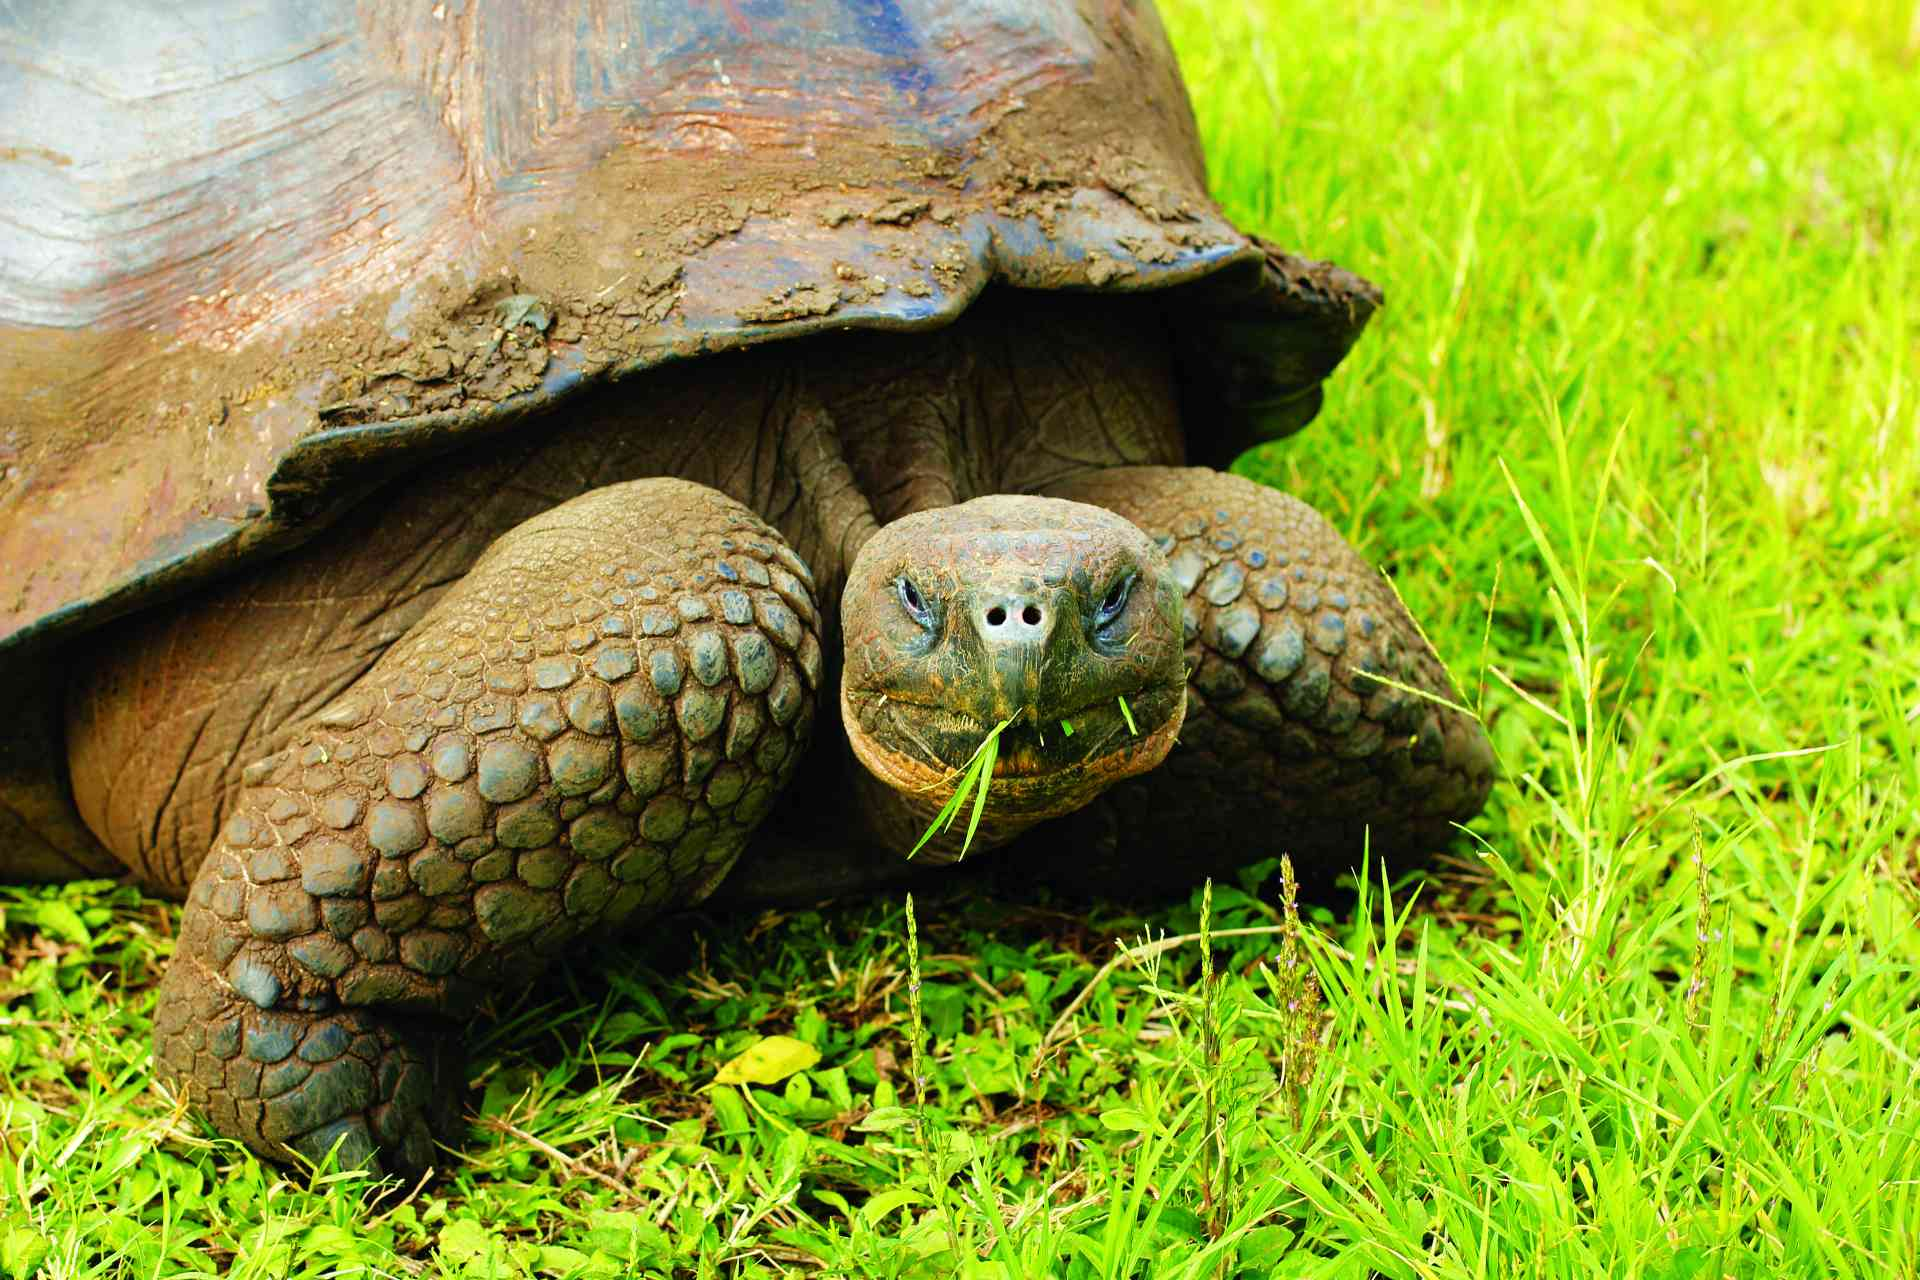 Galapagos Tortoise, Ecuador by David Hammett